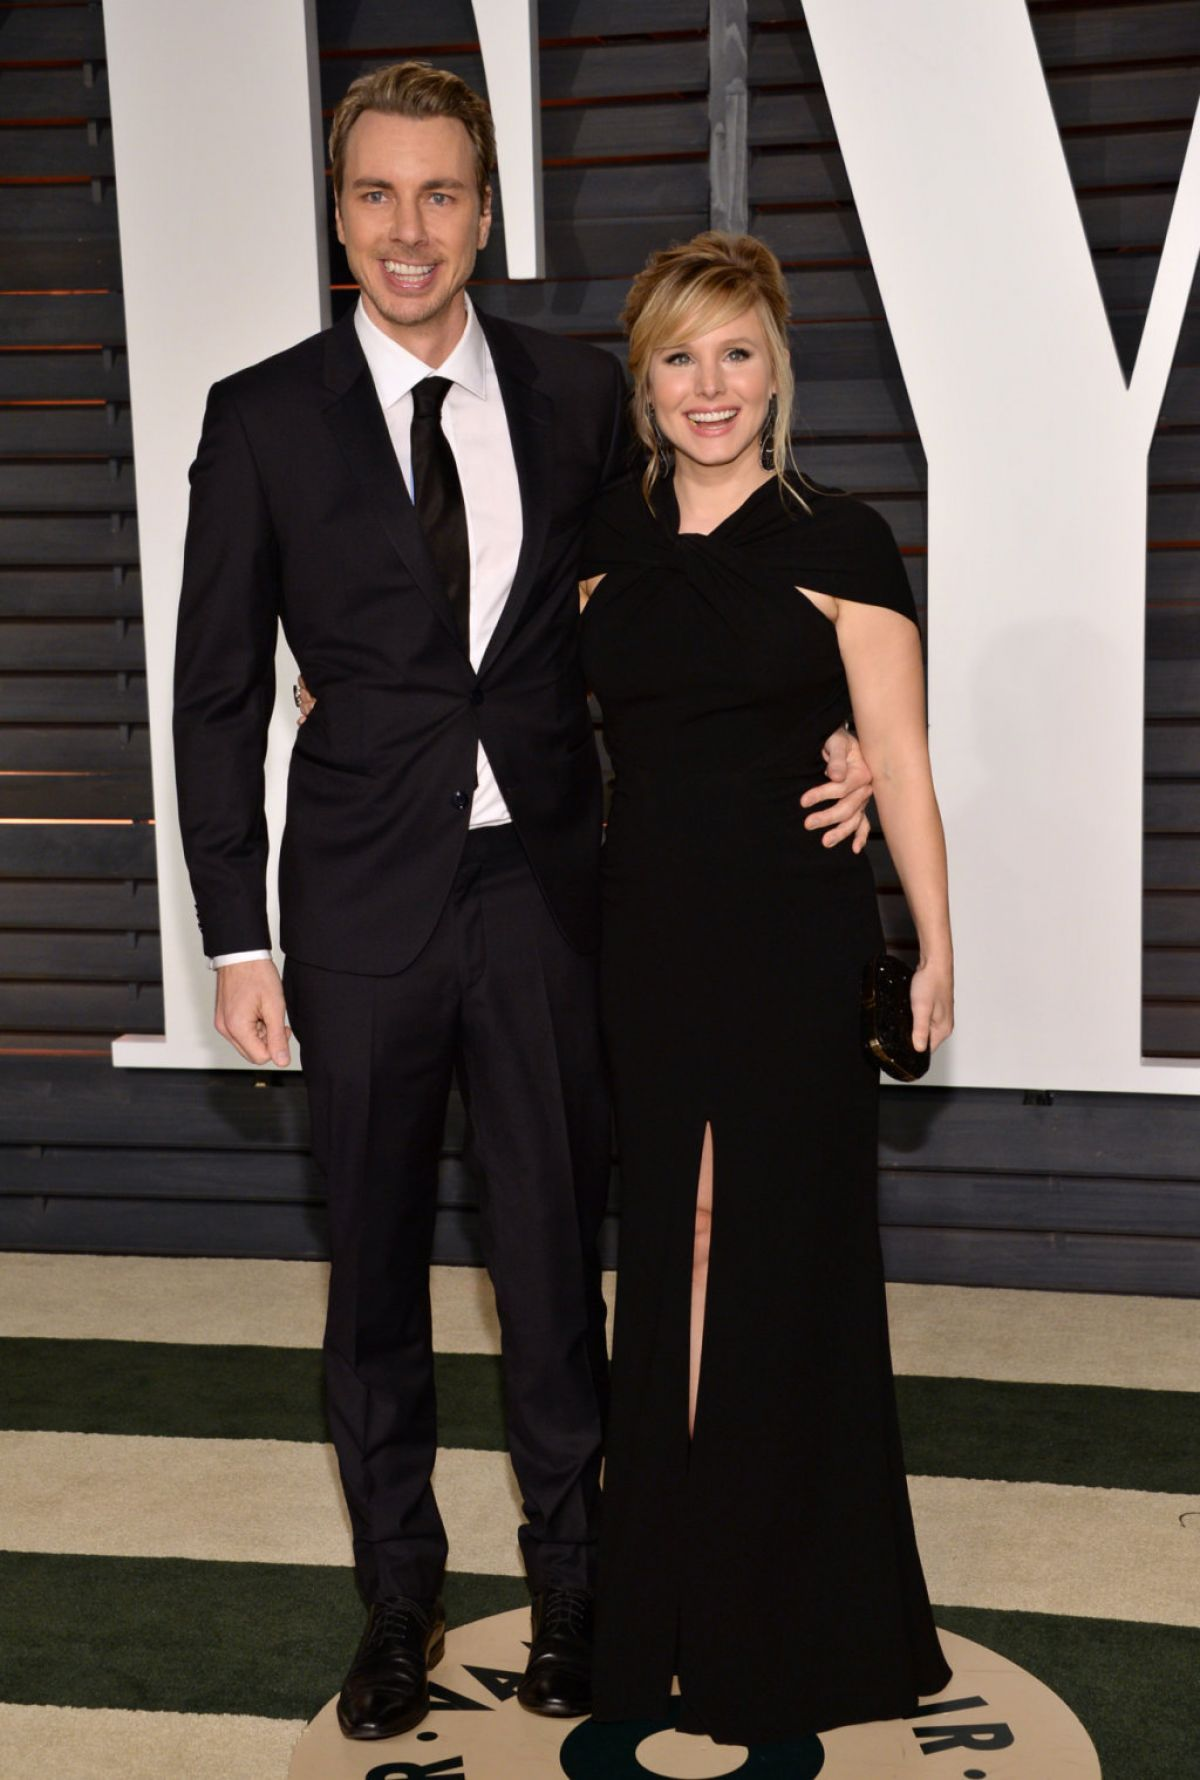 KRISTEN BELL at Vanity Fair Oscar Party in Hollywood